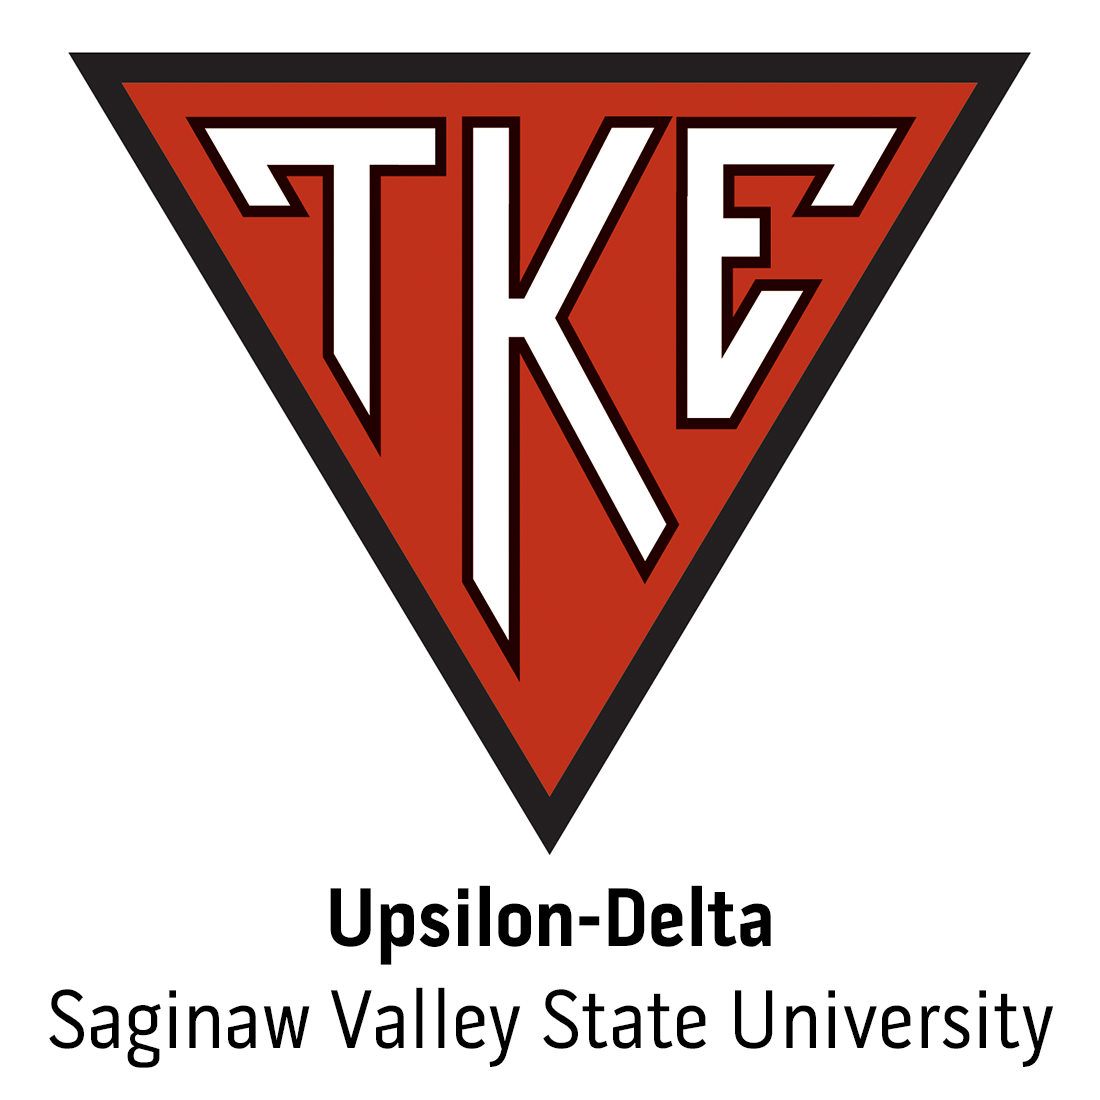 Upsilon-Delta Chapter at Saginaw Valley State University